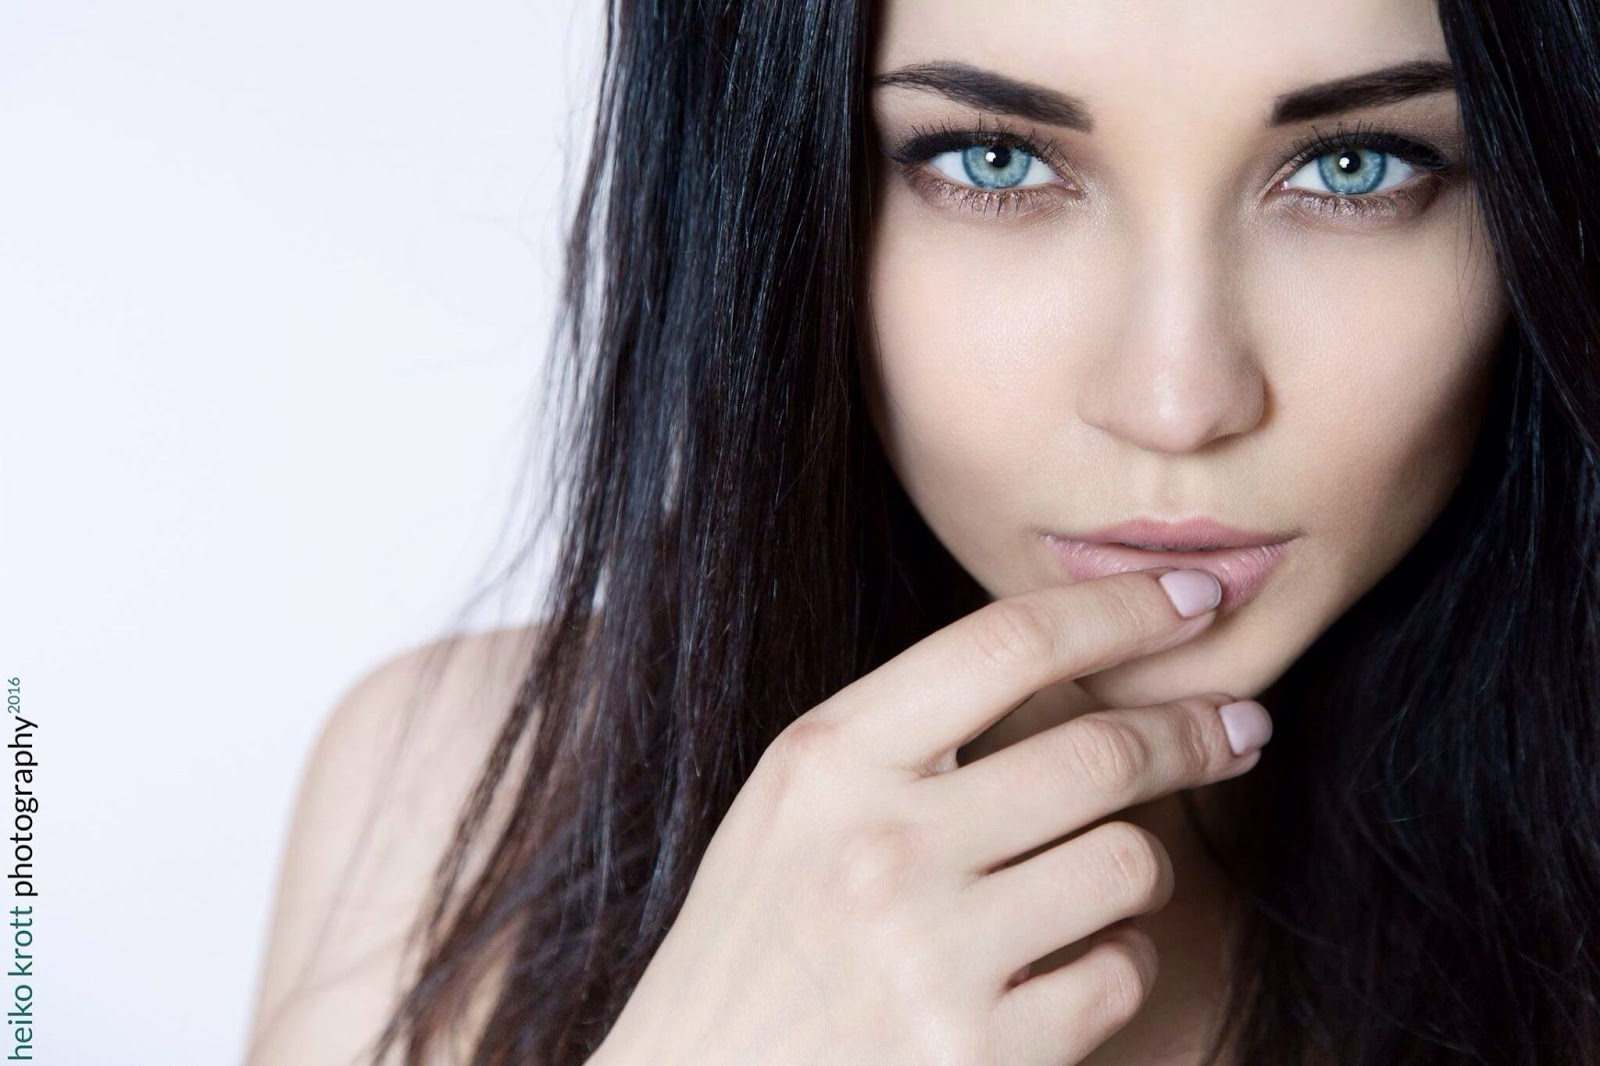 blue eye jewish single women Xvideos blue-eyed videos, free xvideoscom - the best free porn videos on internet, 100% free.